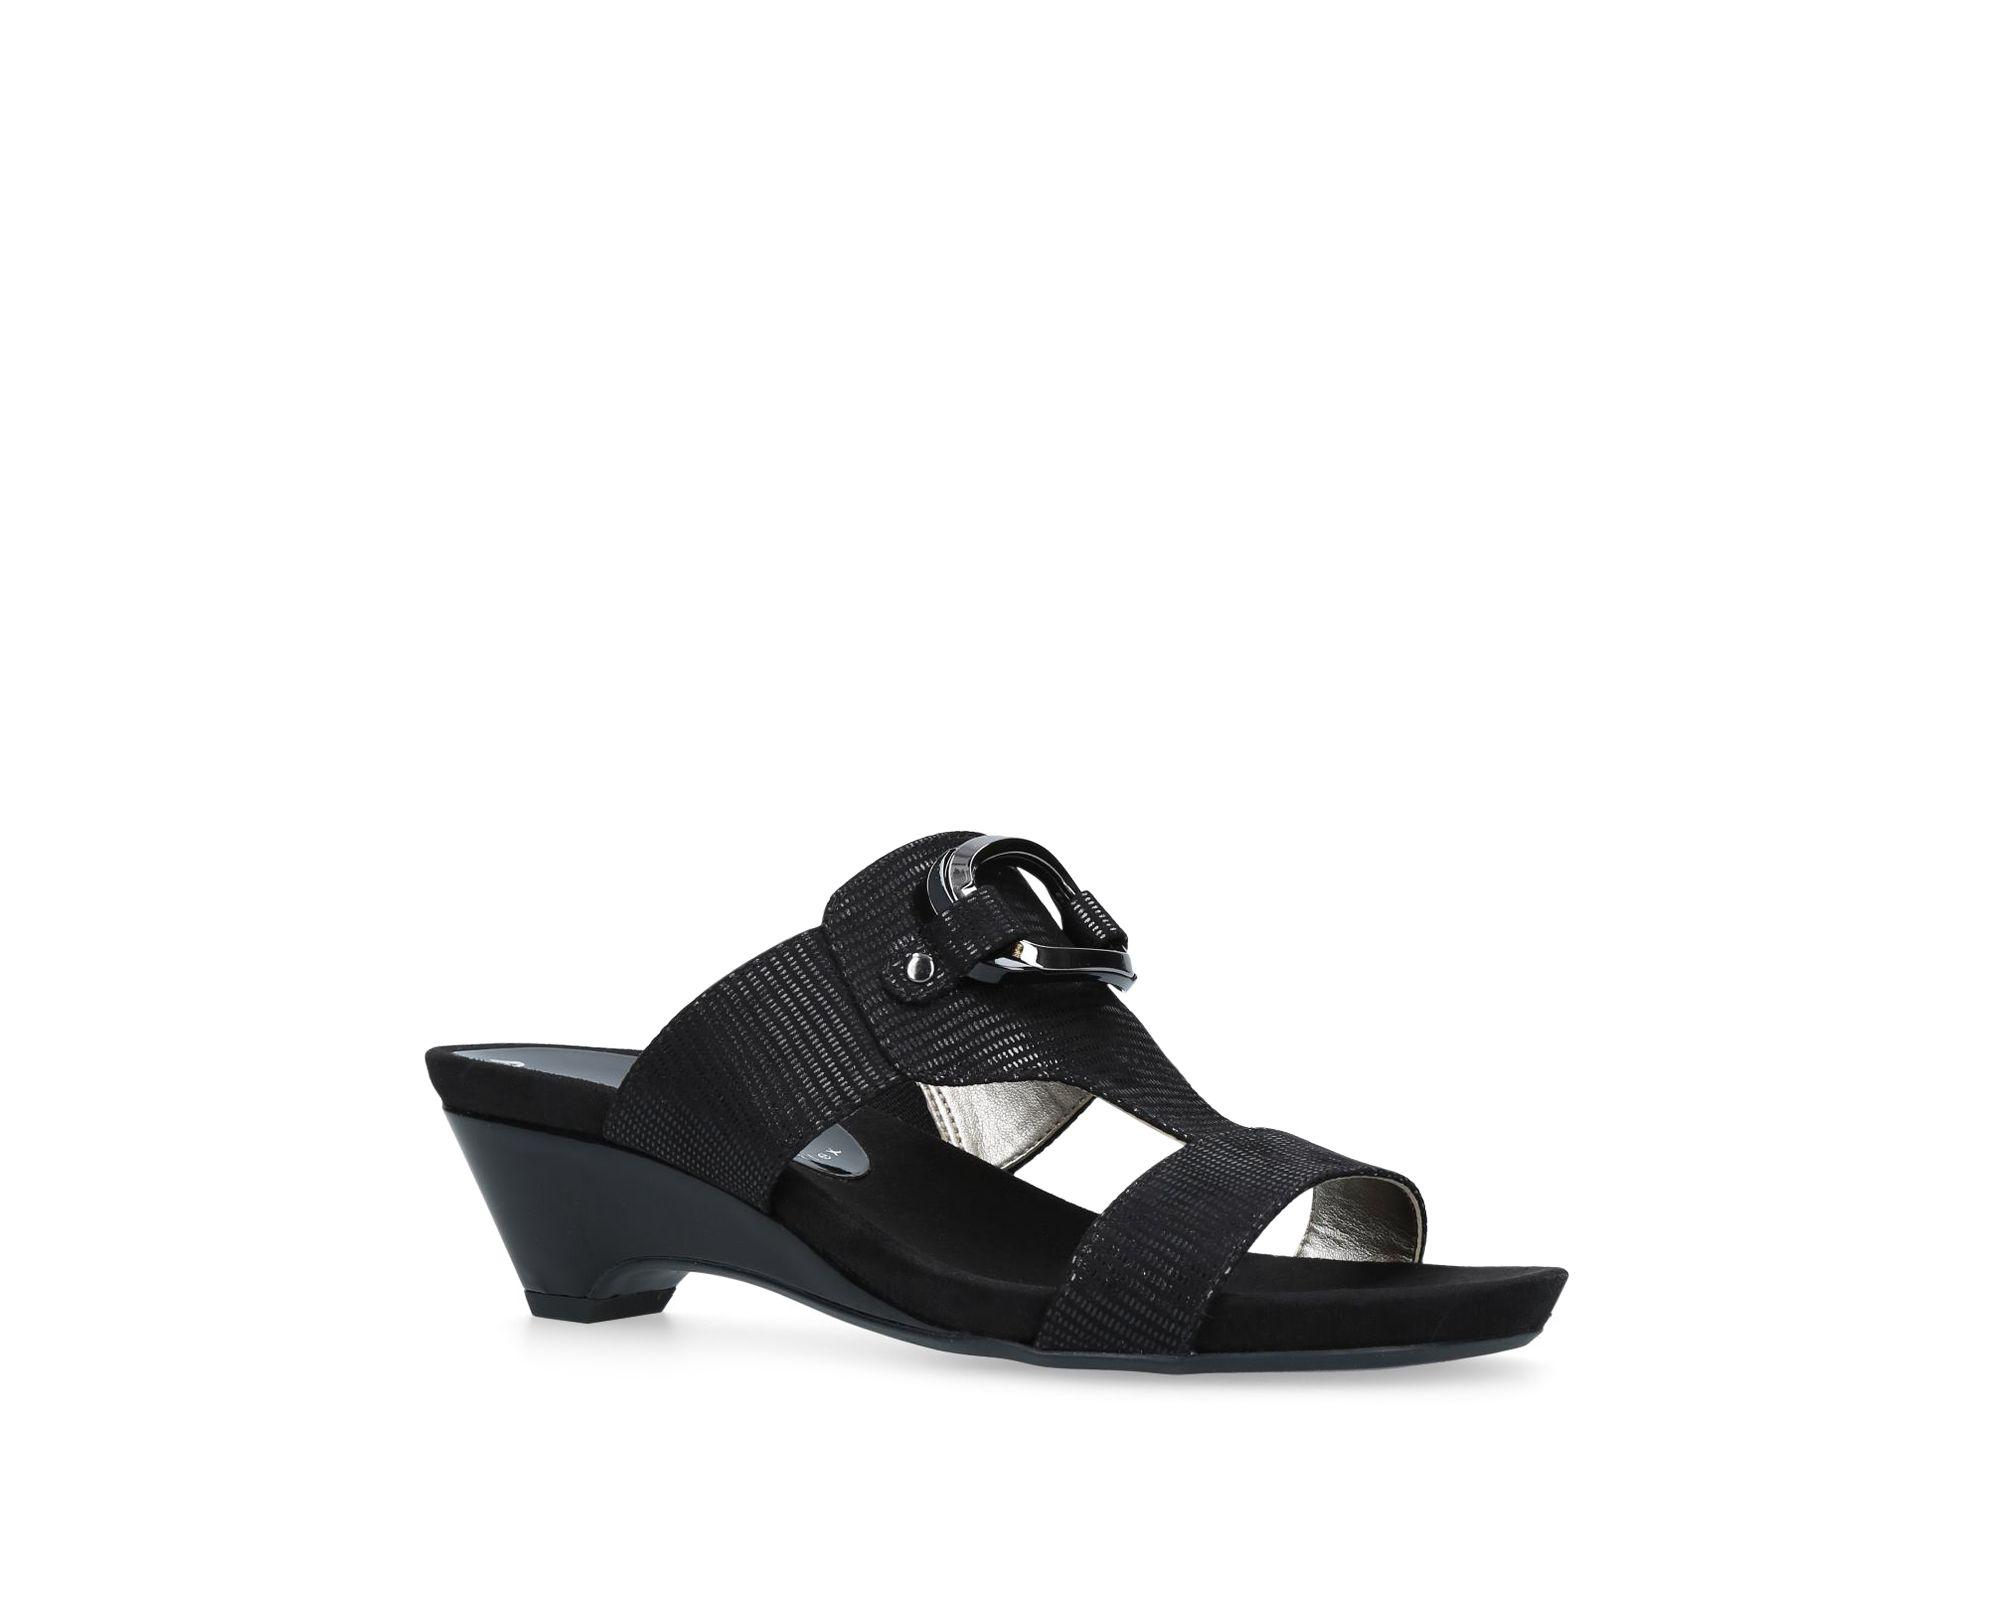 9476a53881826 Anne Klein 'teela' Shoes in Black - Lyst anne klein sandals debenhams